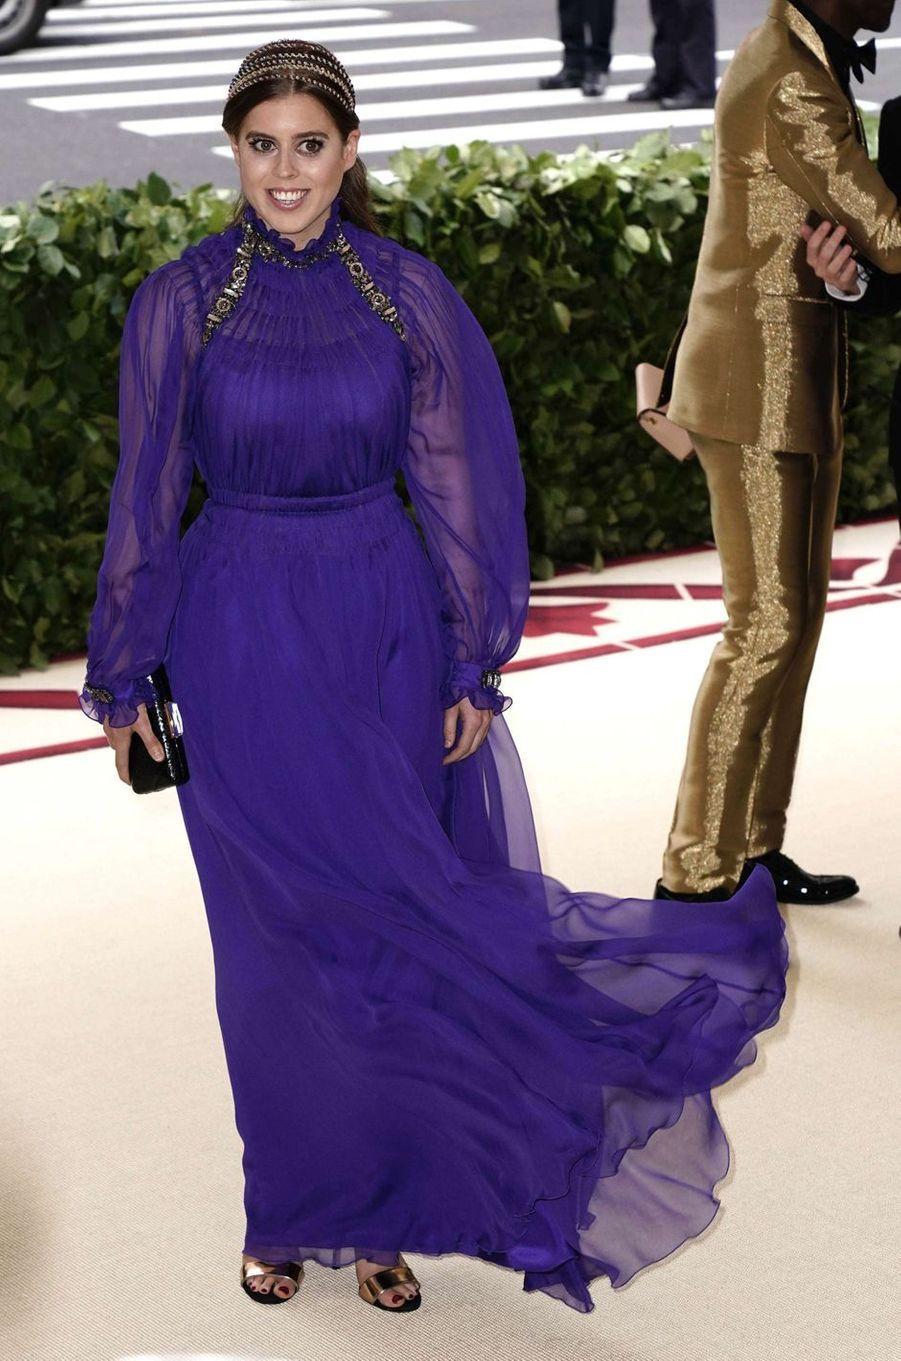 La princesse Beatrice d'York, en Alberta Ferretti, au Met Gala à New York le 7 mai 2018